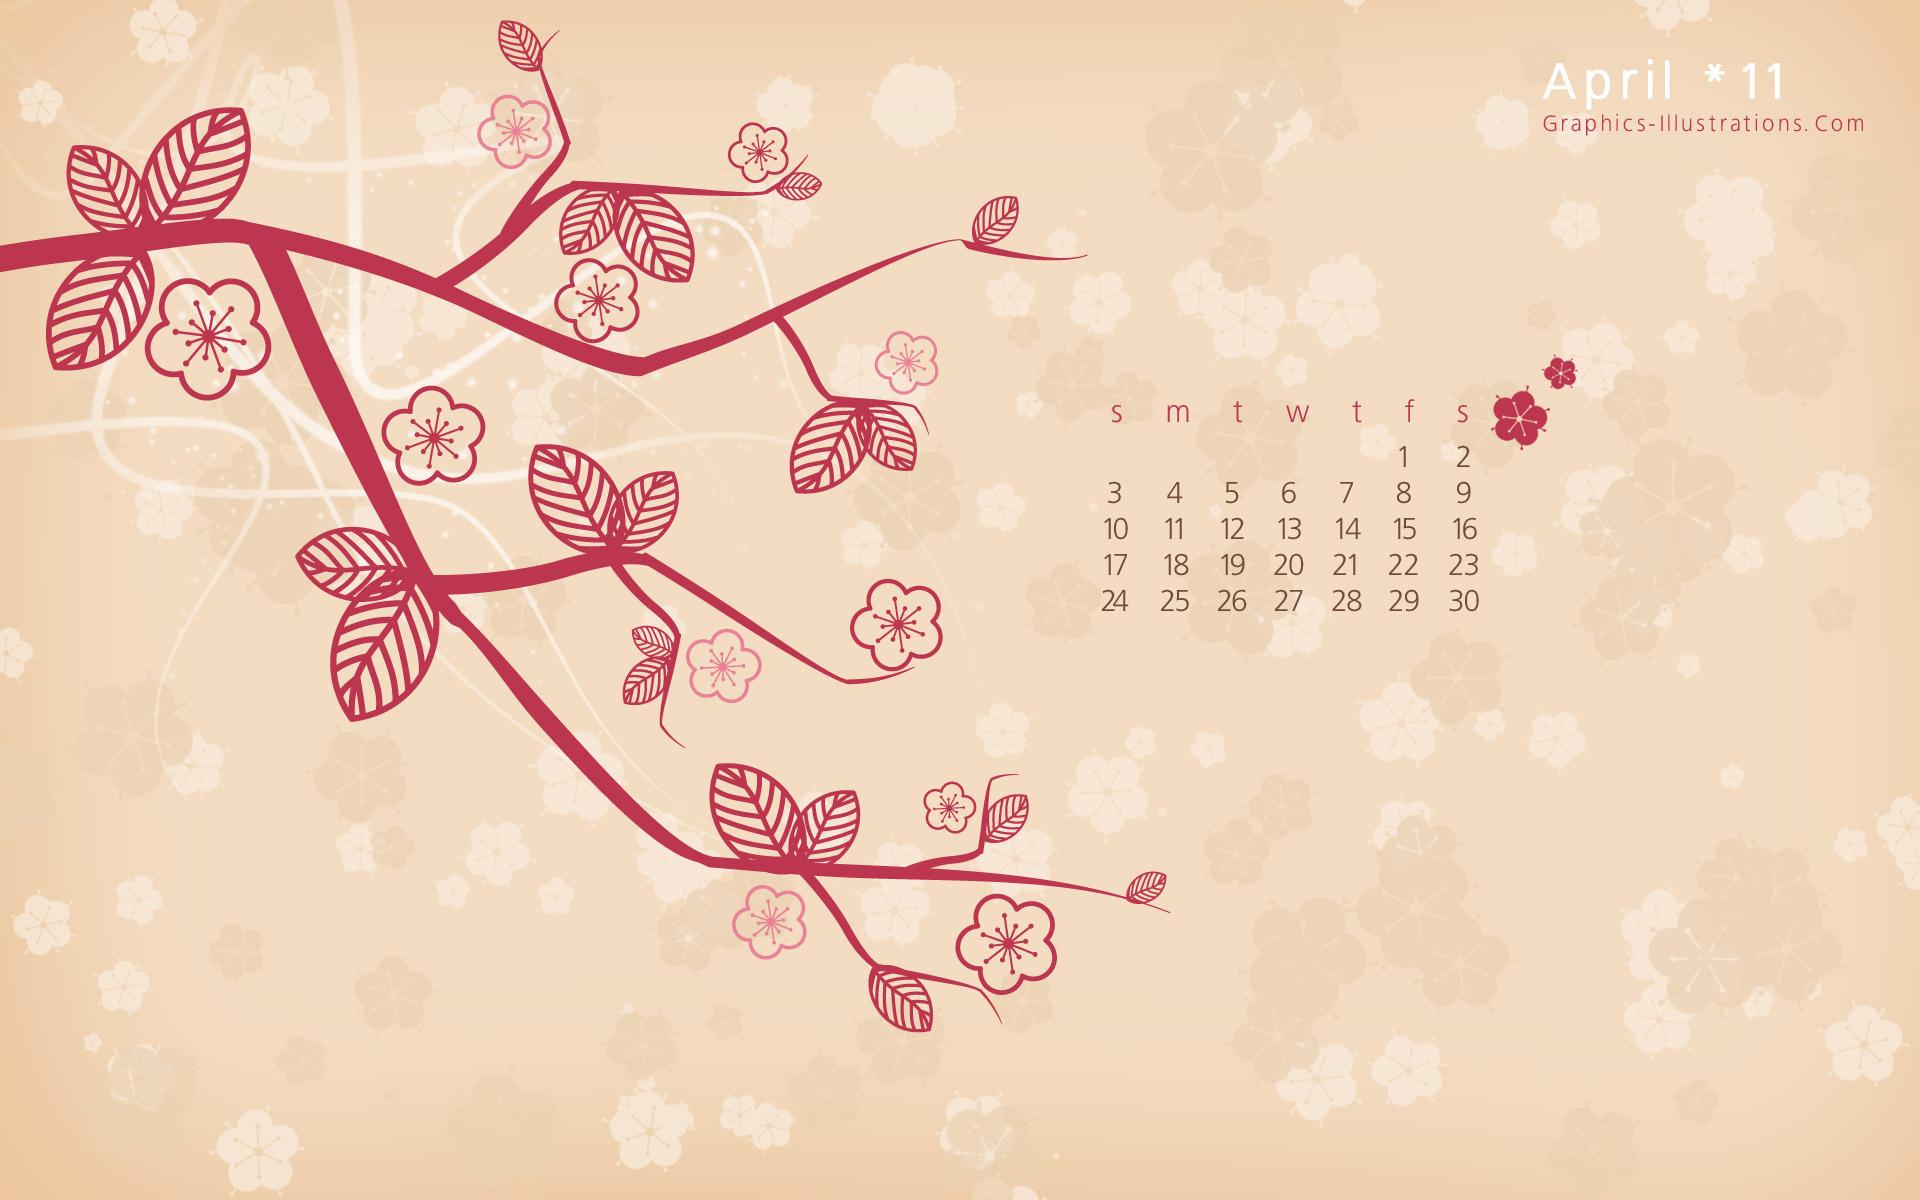 japanese wallpapers april 2011 -#main